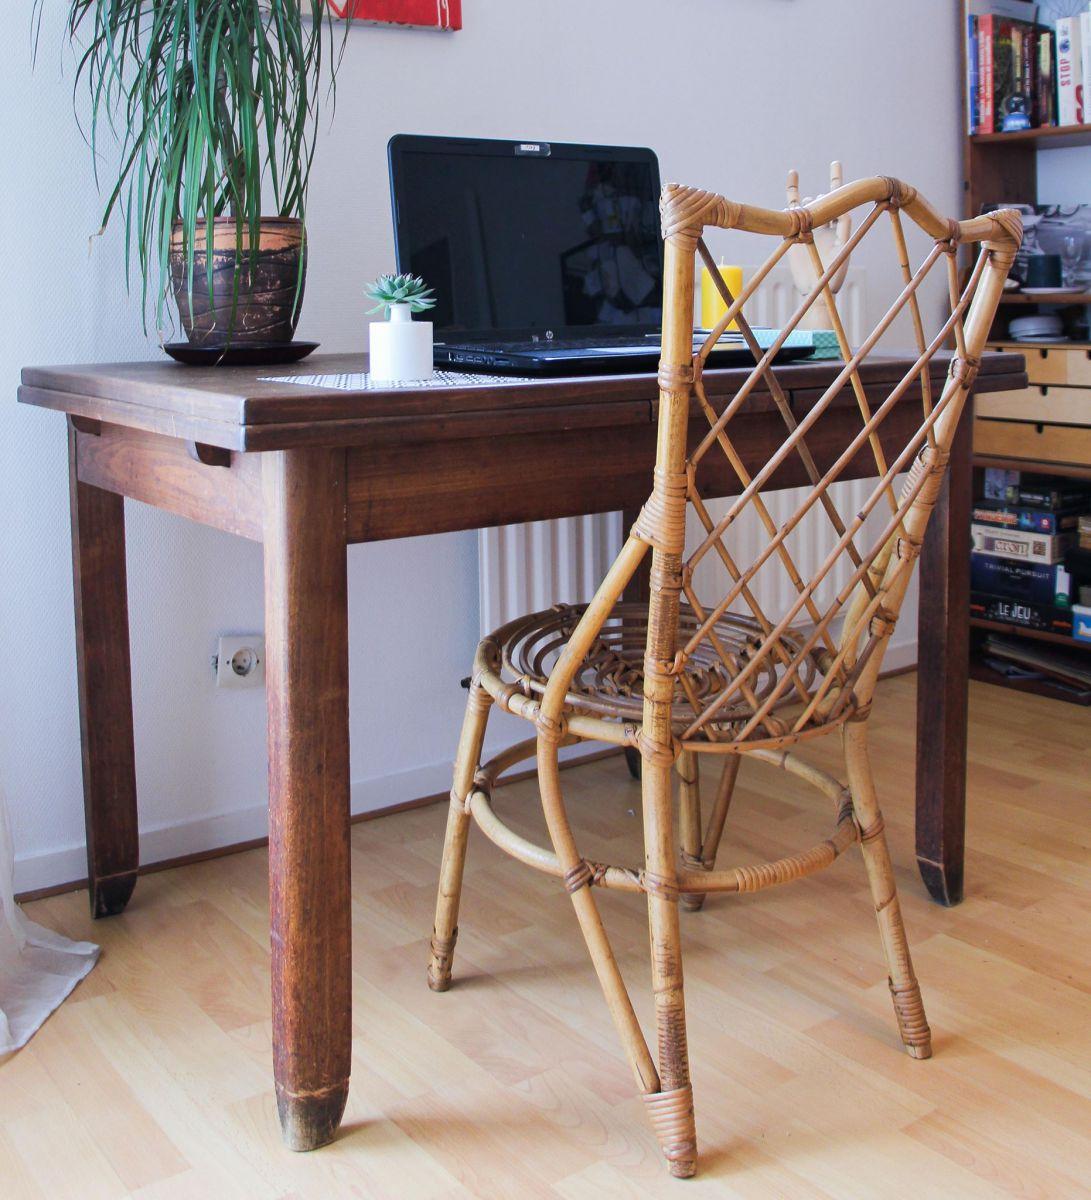 chaise en rotin vintage ann es 60 luckyfind. Black Bedroom Furniture Sets. Home Design Ideas